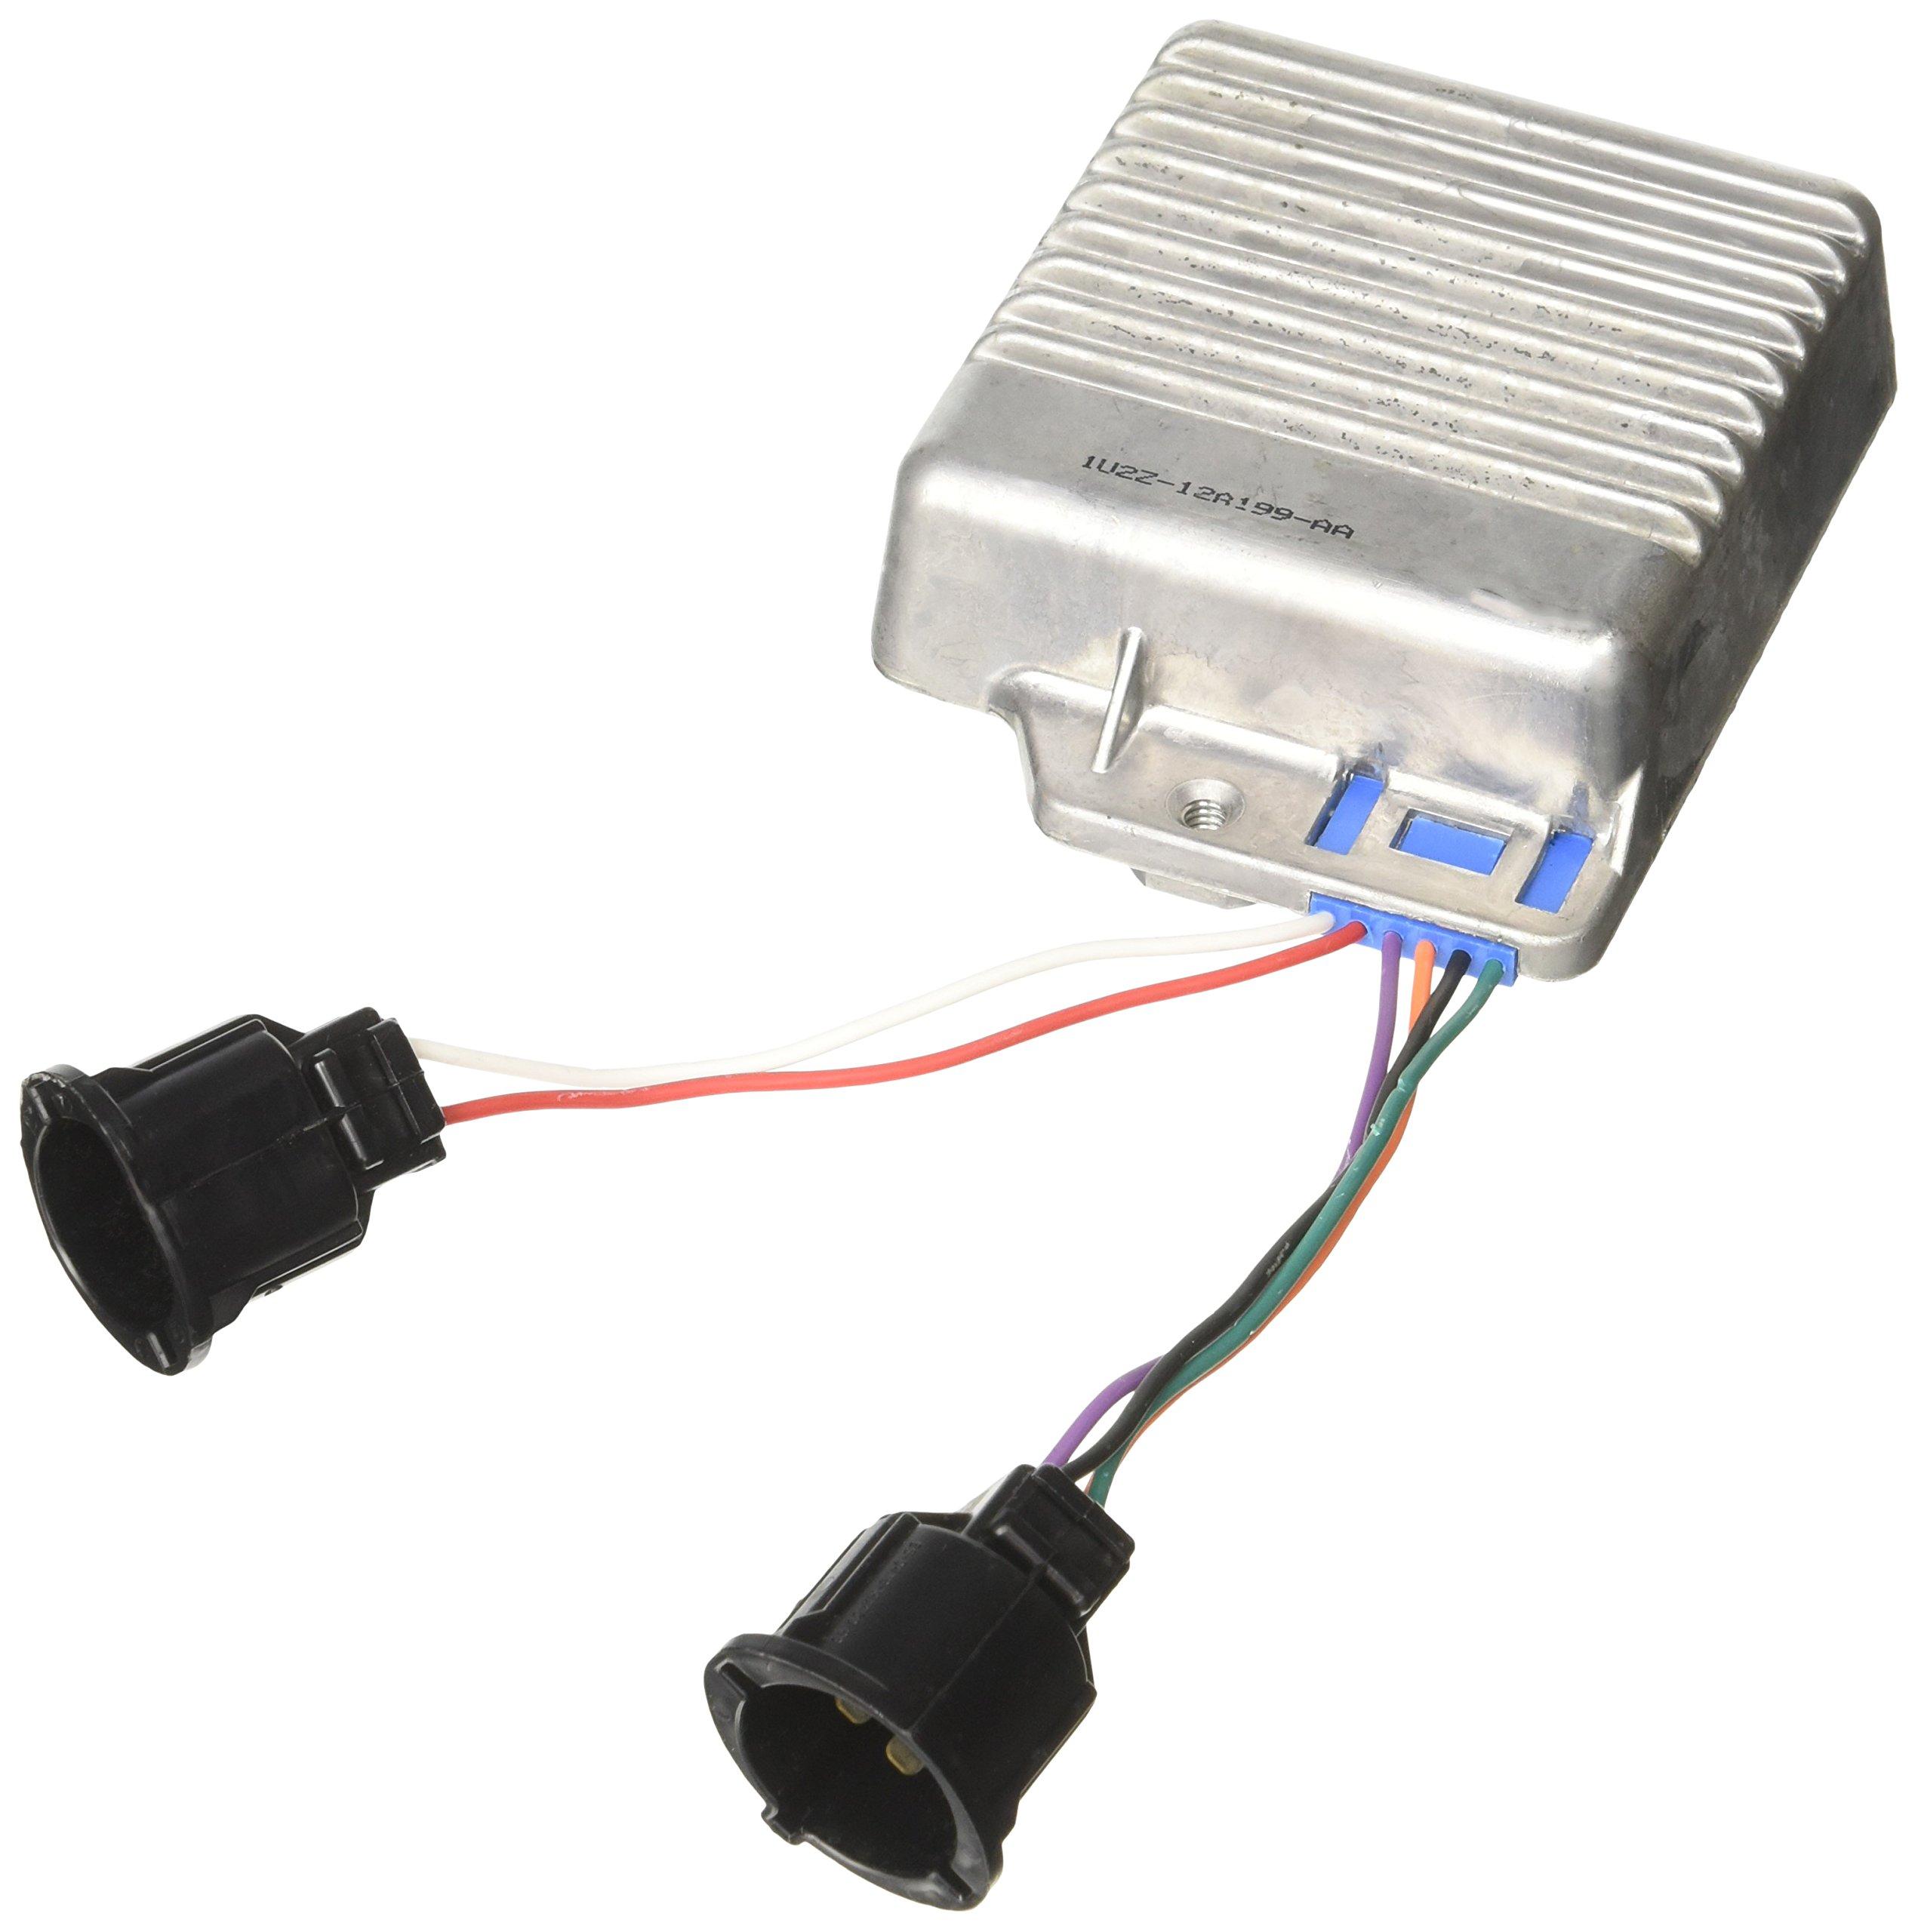 Motorcraft DY893 Ignition Control Control Module